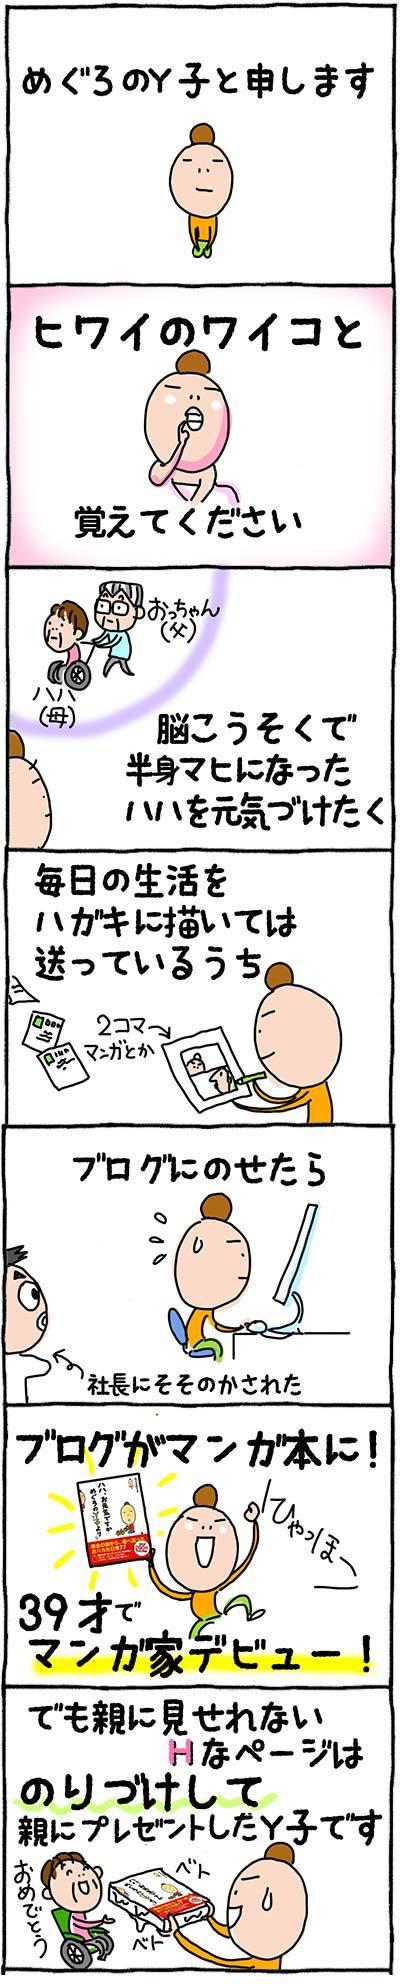 170707自己紹介01